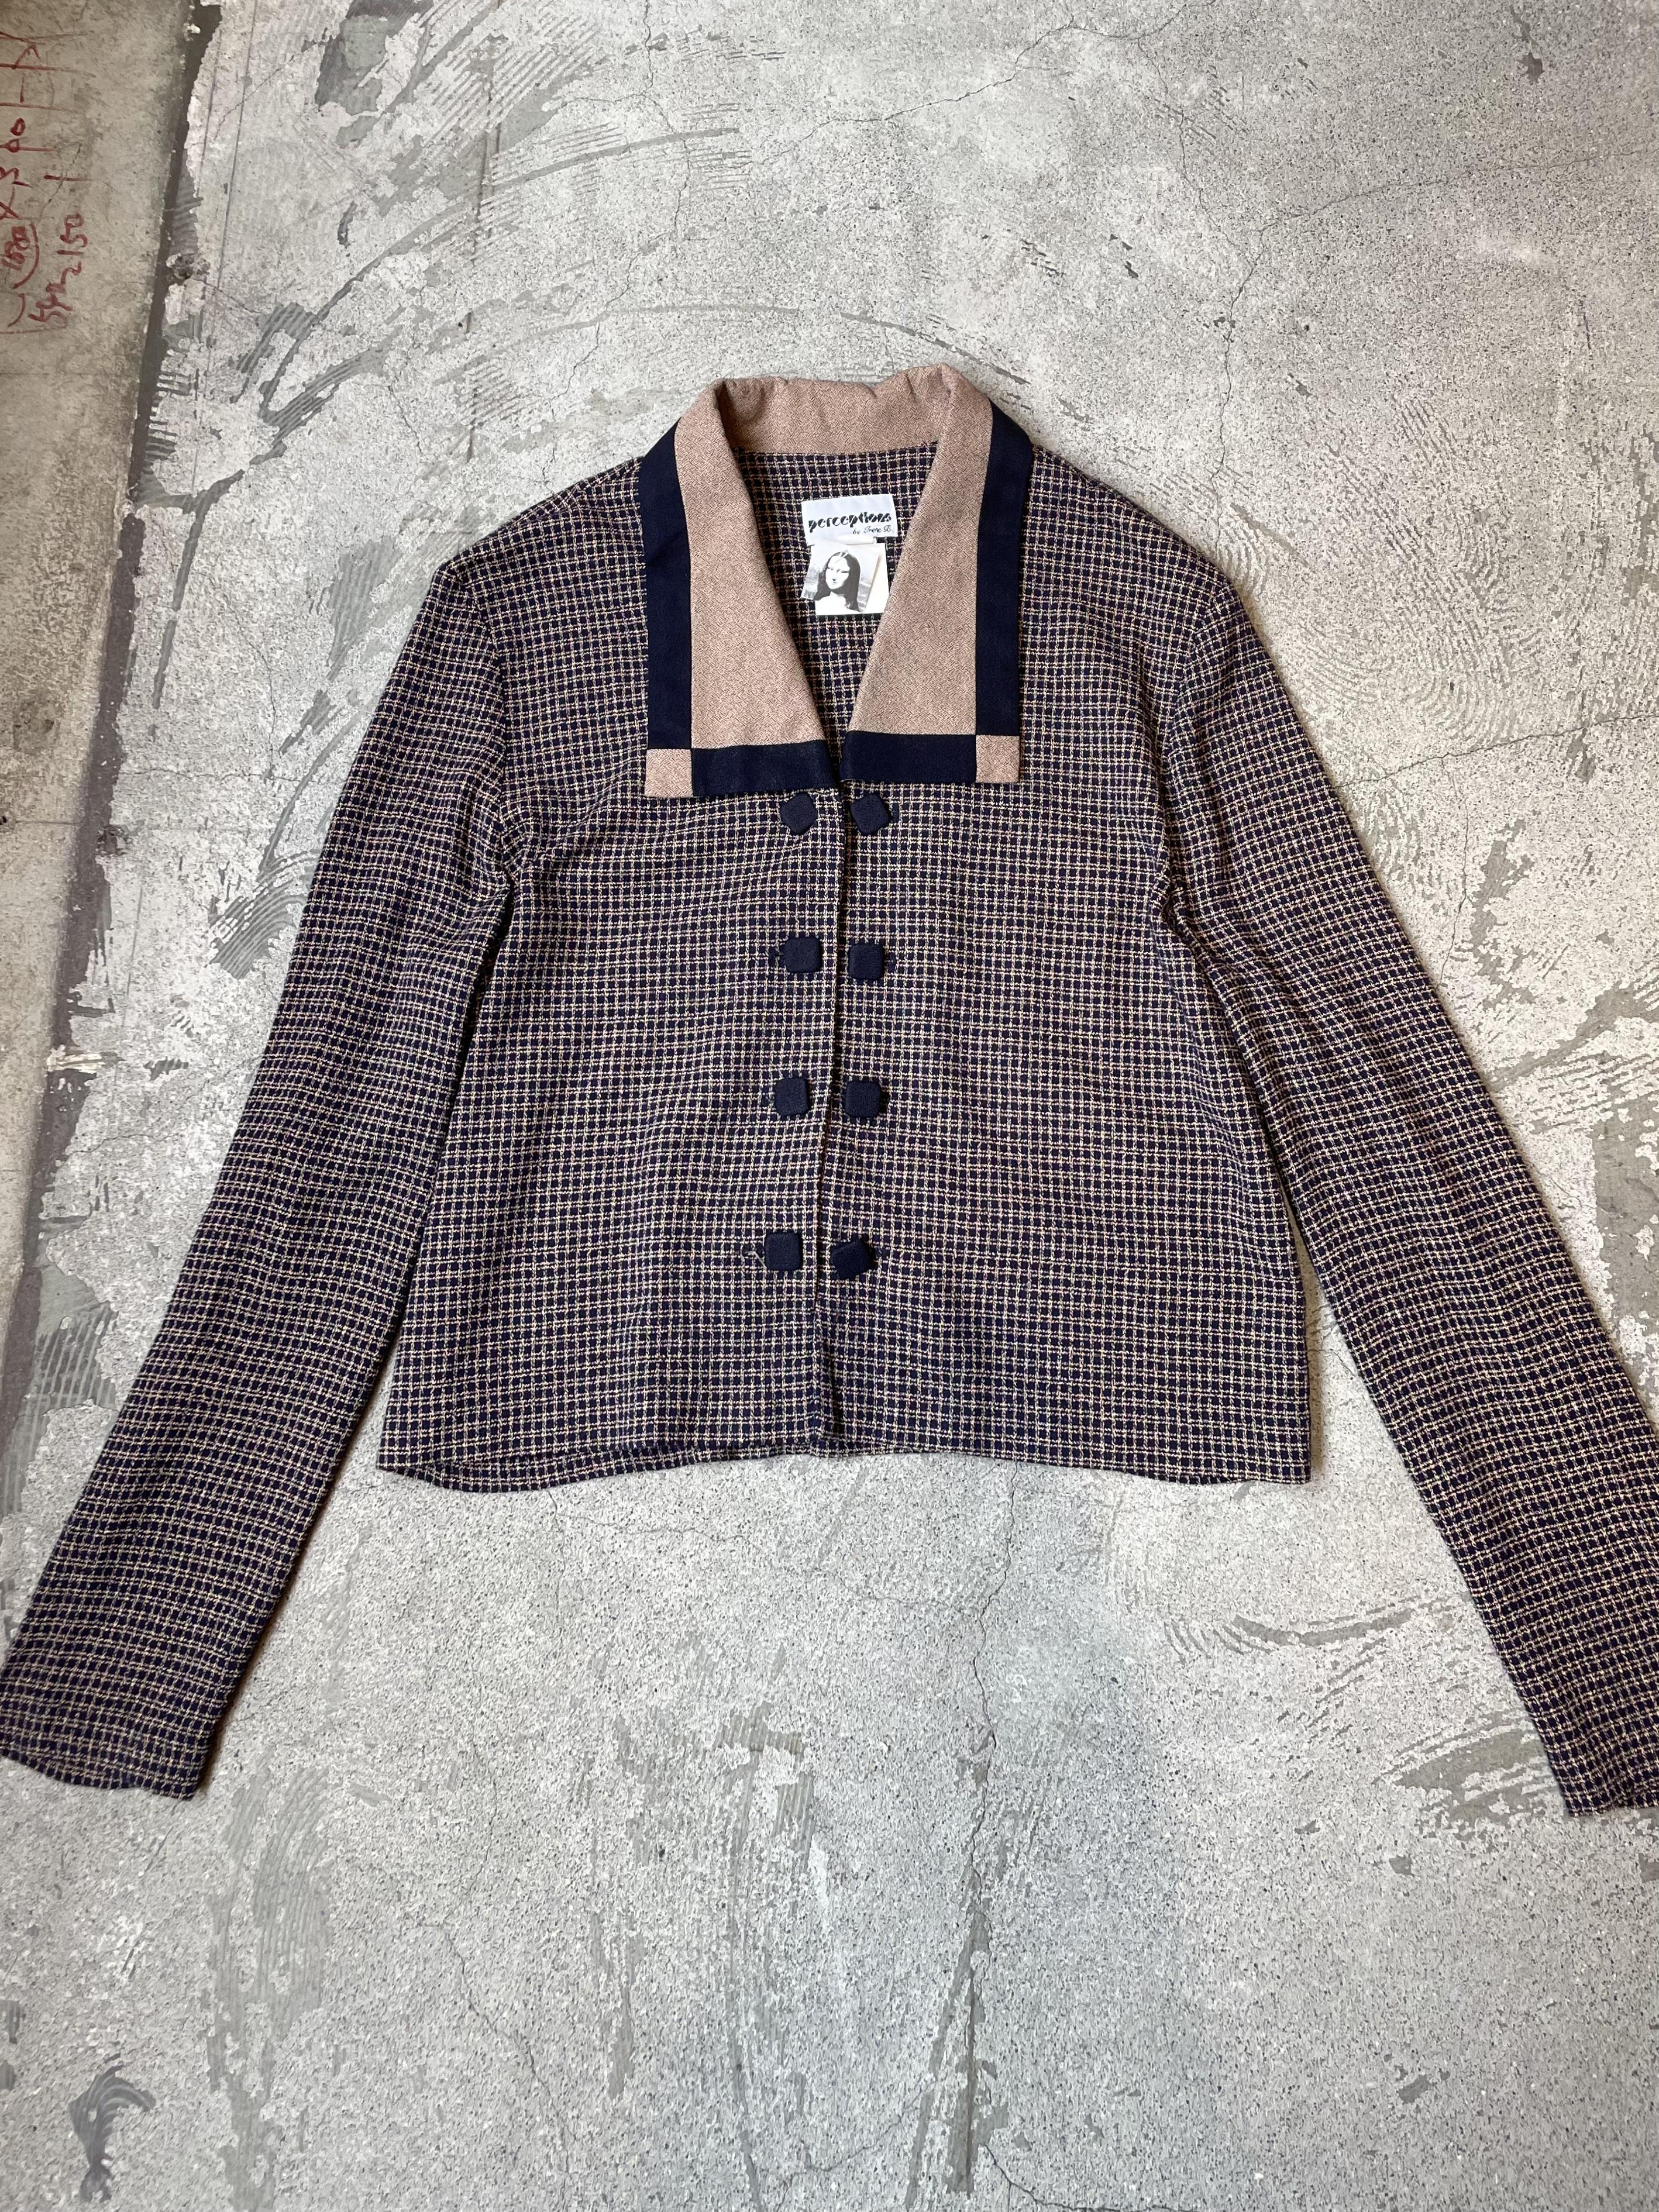 vintage check pattern jacket